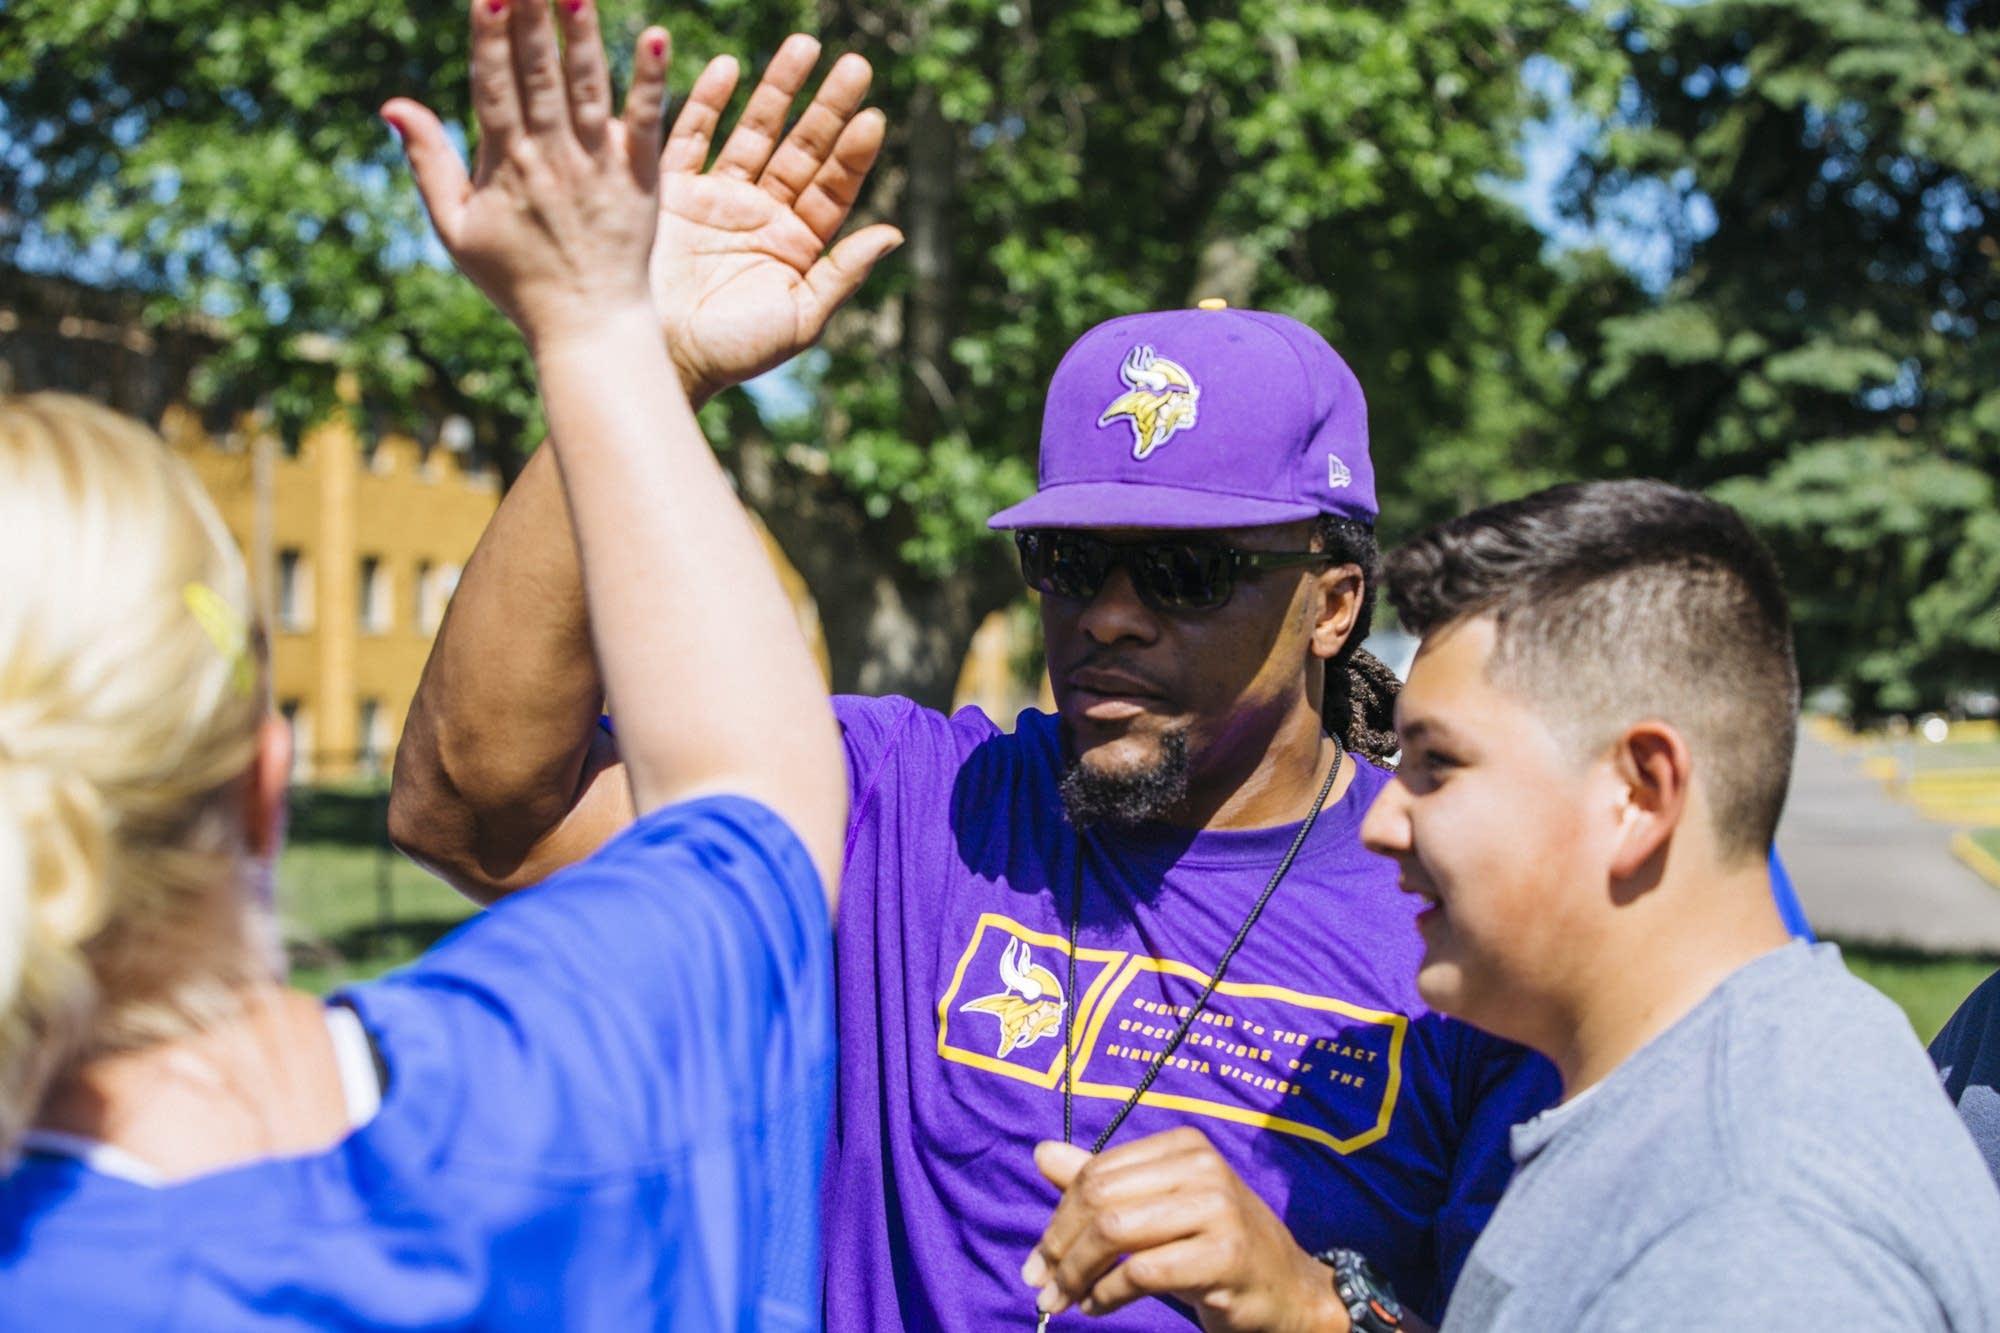 E.J. Henderson gives a high-five